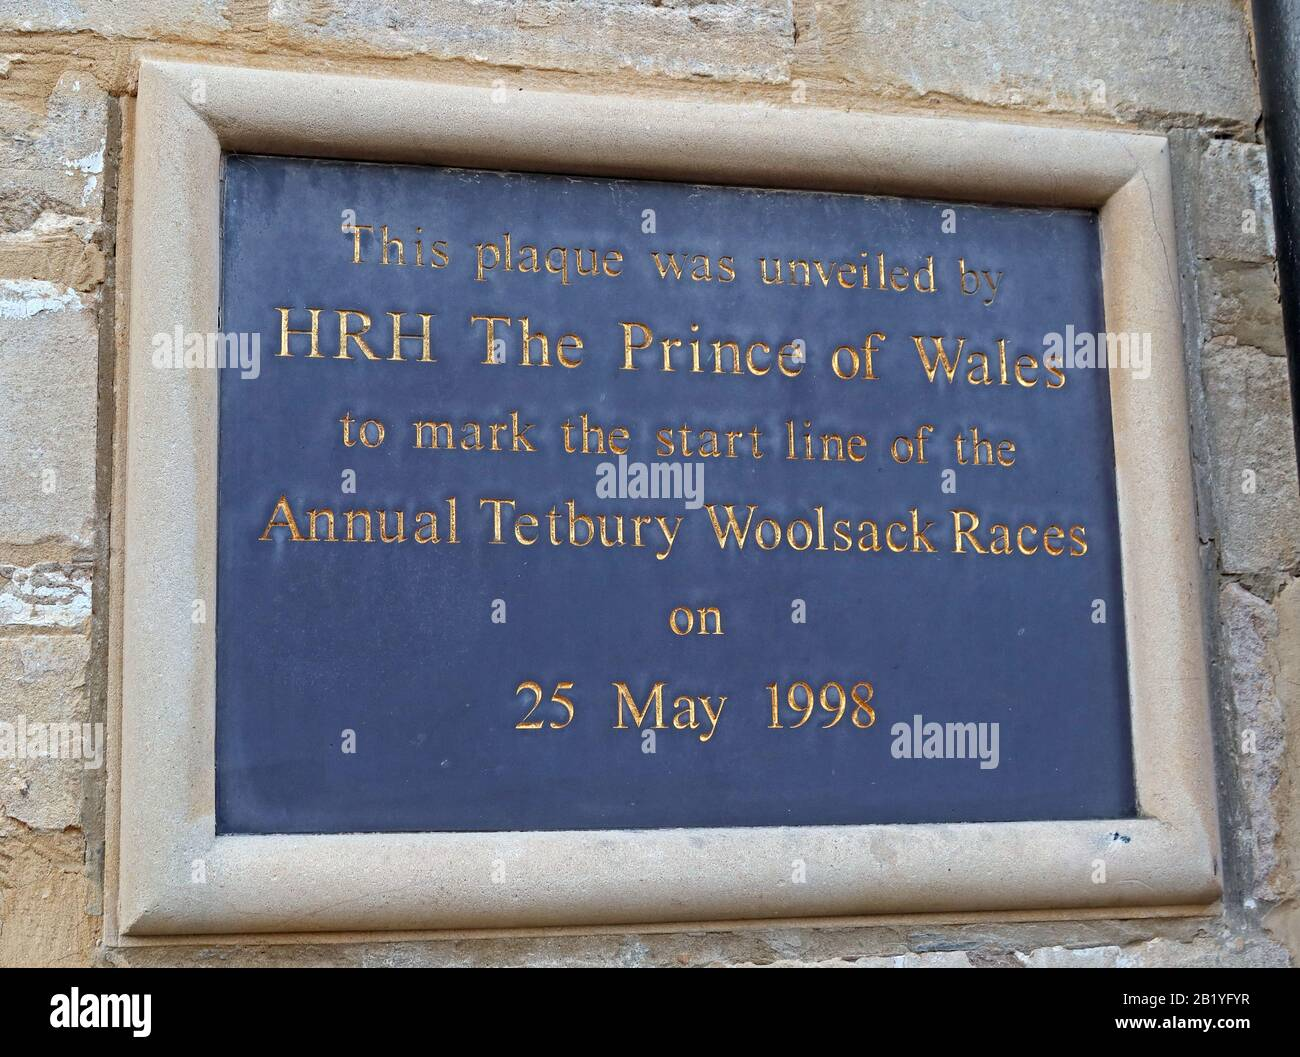 HotpixUK,@HotpixUK,GoTonySmith,UK,England,South West,district,Tetbury,Woolsack,RaceWool,sack,Charles,Prince Of Wales,1998,25 May 1998,start line,Races,Crown pub,Crown Bar